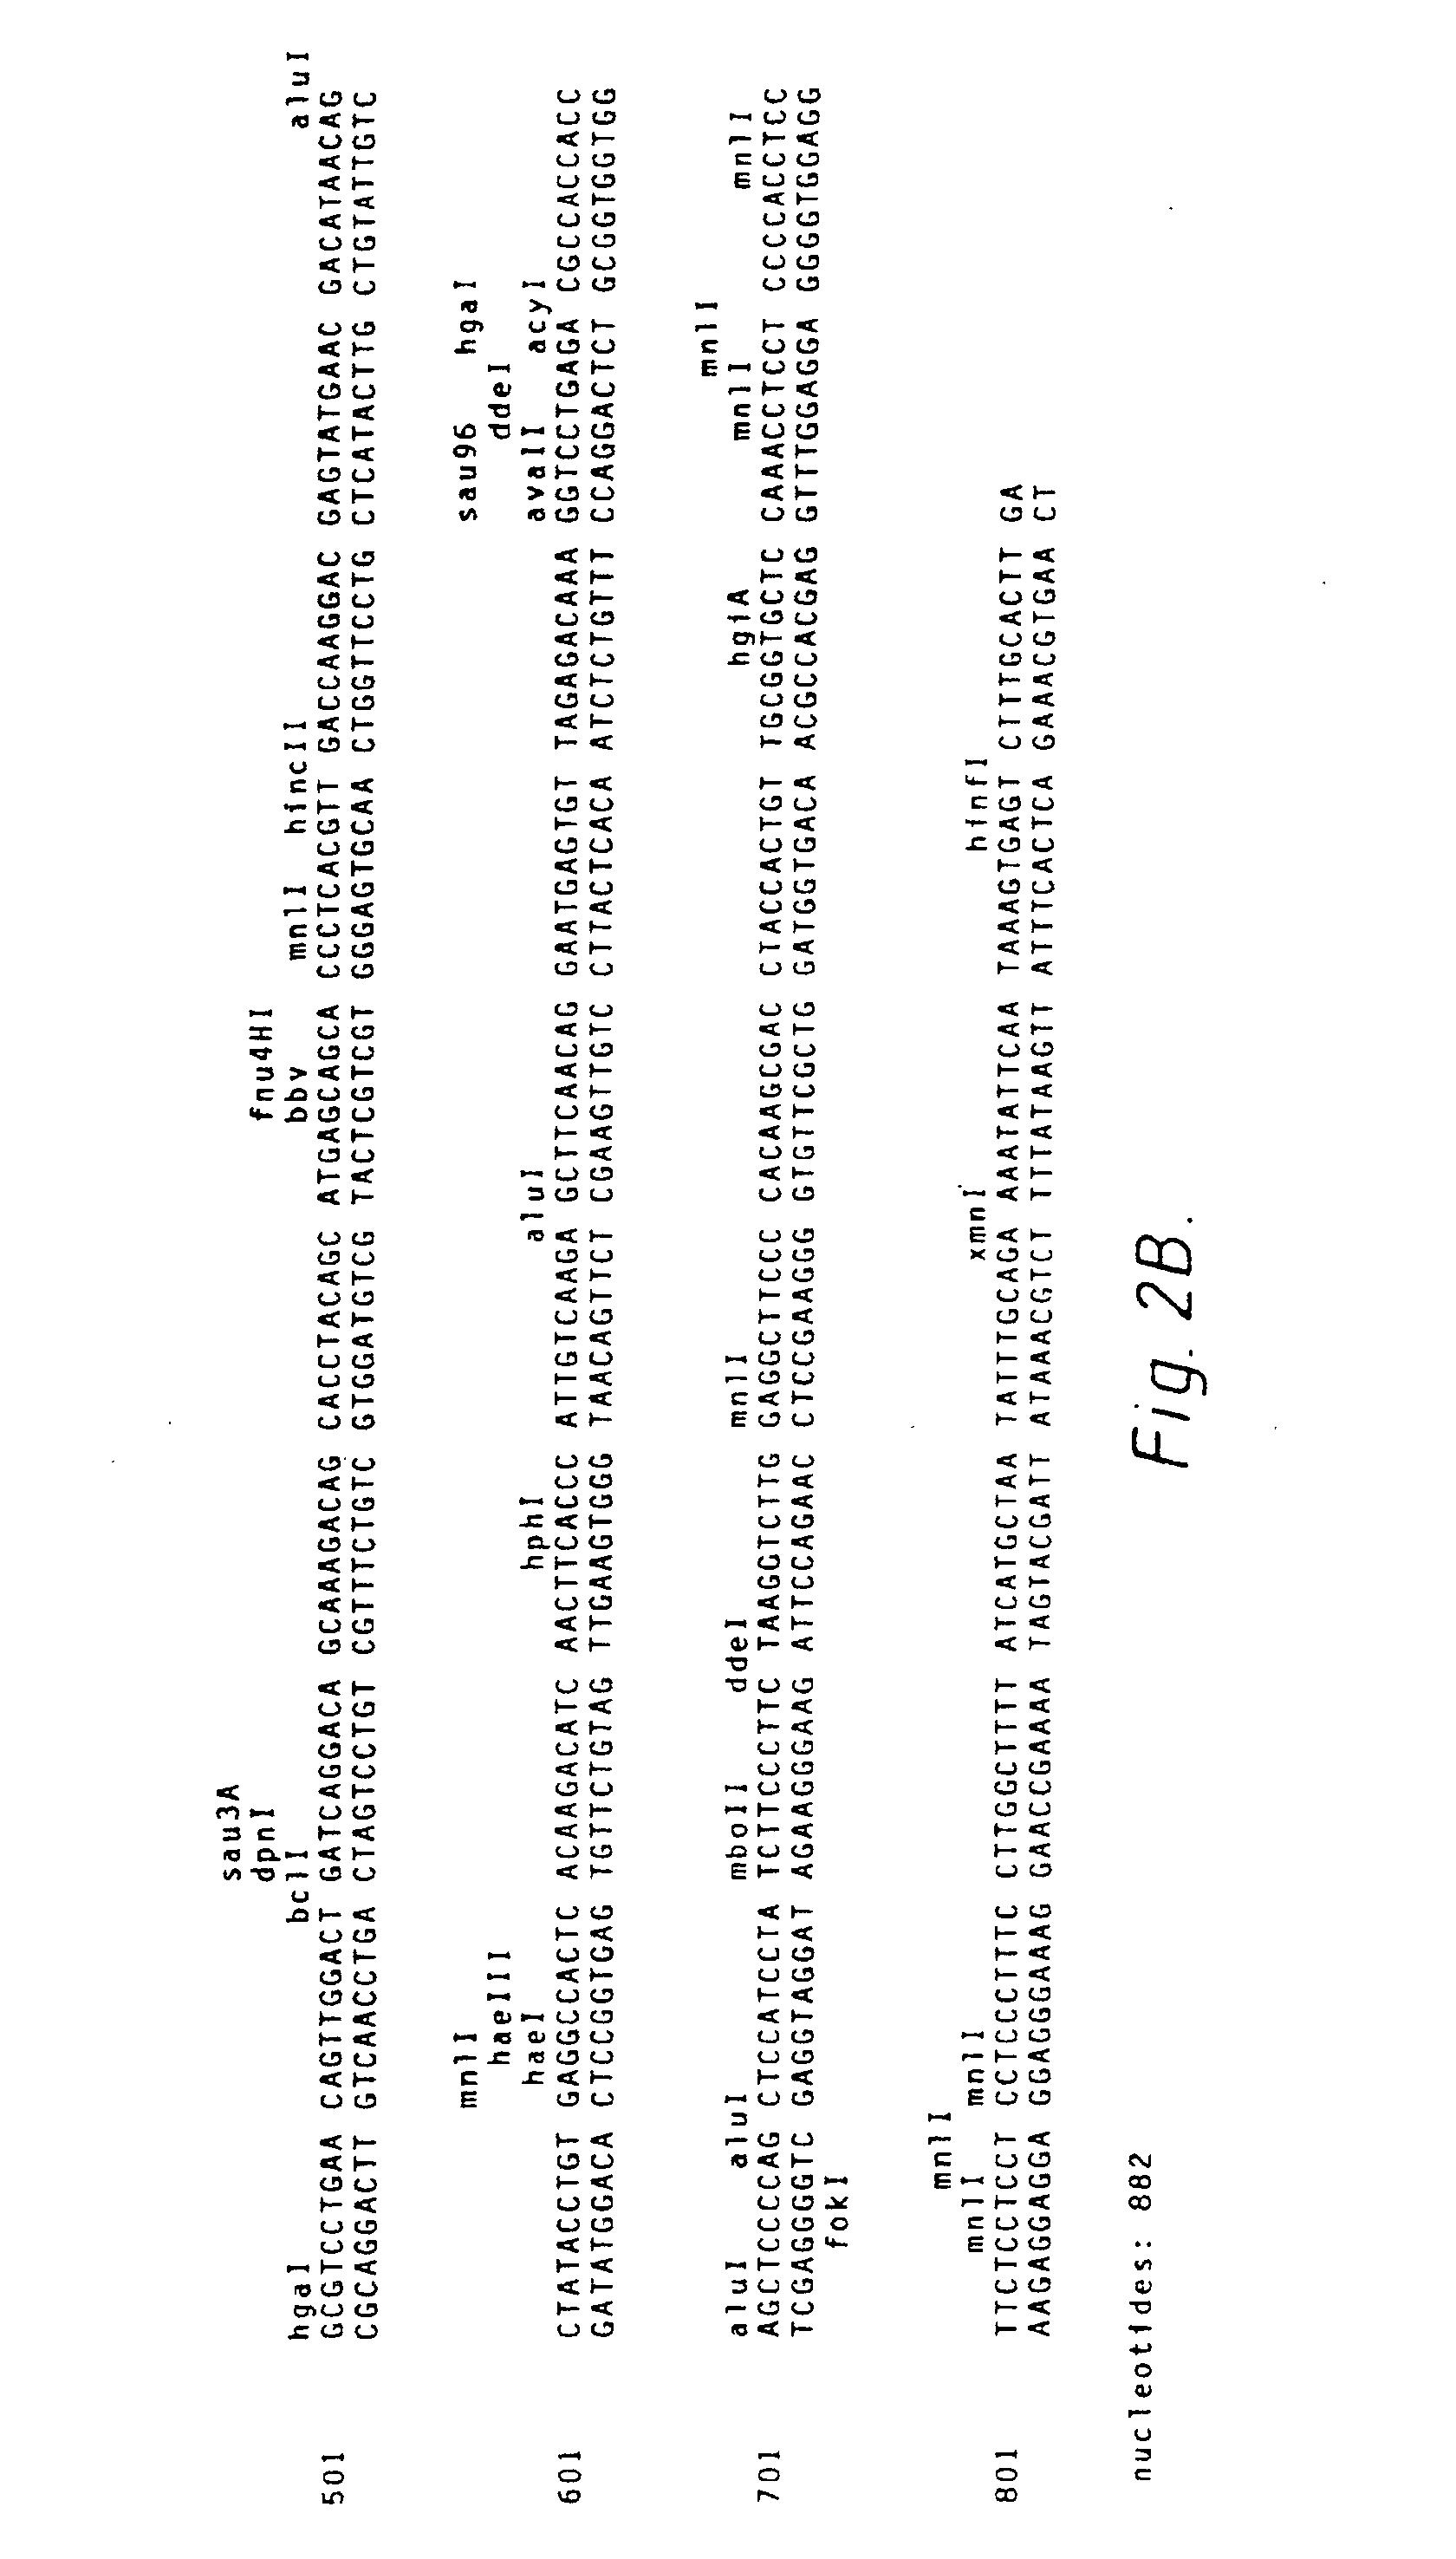 Ep0125023b2 Recombinant Immunoglobulin Preparations Google Patents Westfieldworld Kitcar Support Site Westfield Wiring Diagram